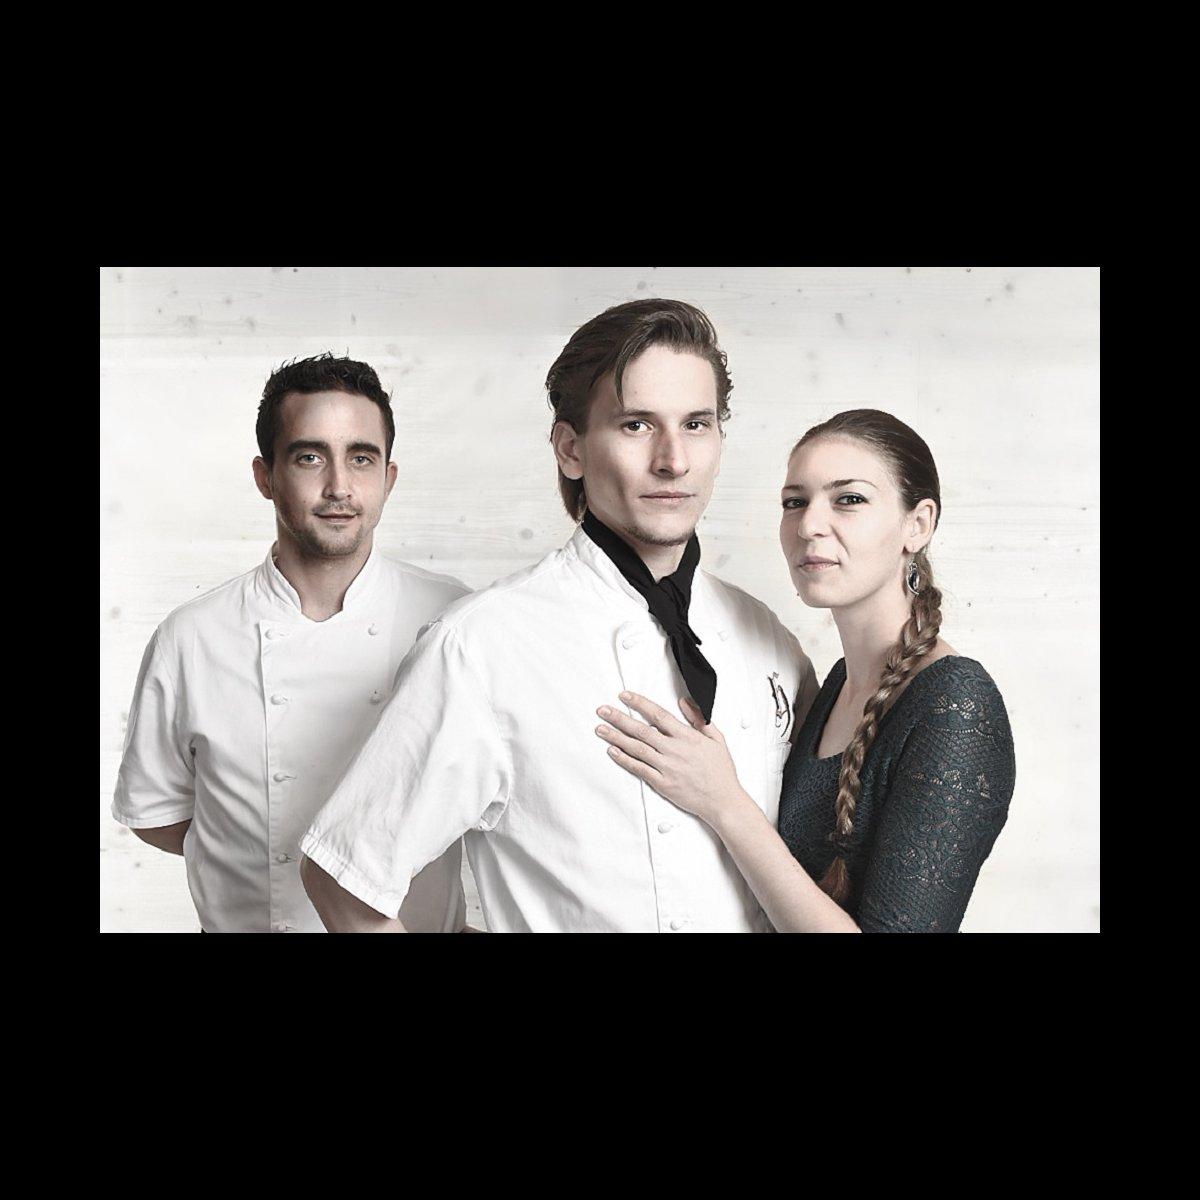 Heimat Team (Manuel Fichter, Tim Munz, Melina Rychener)